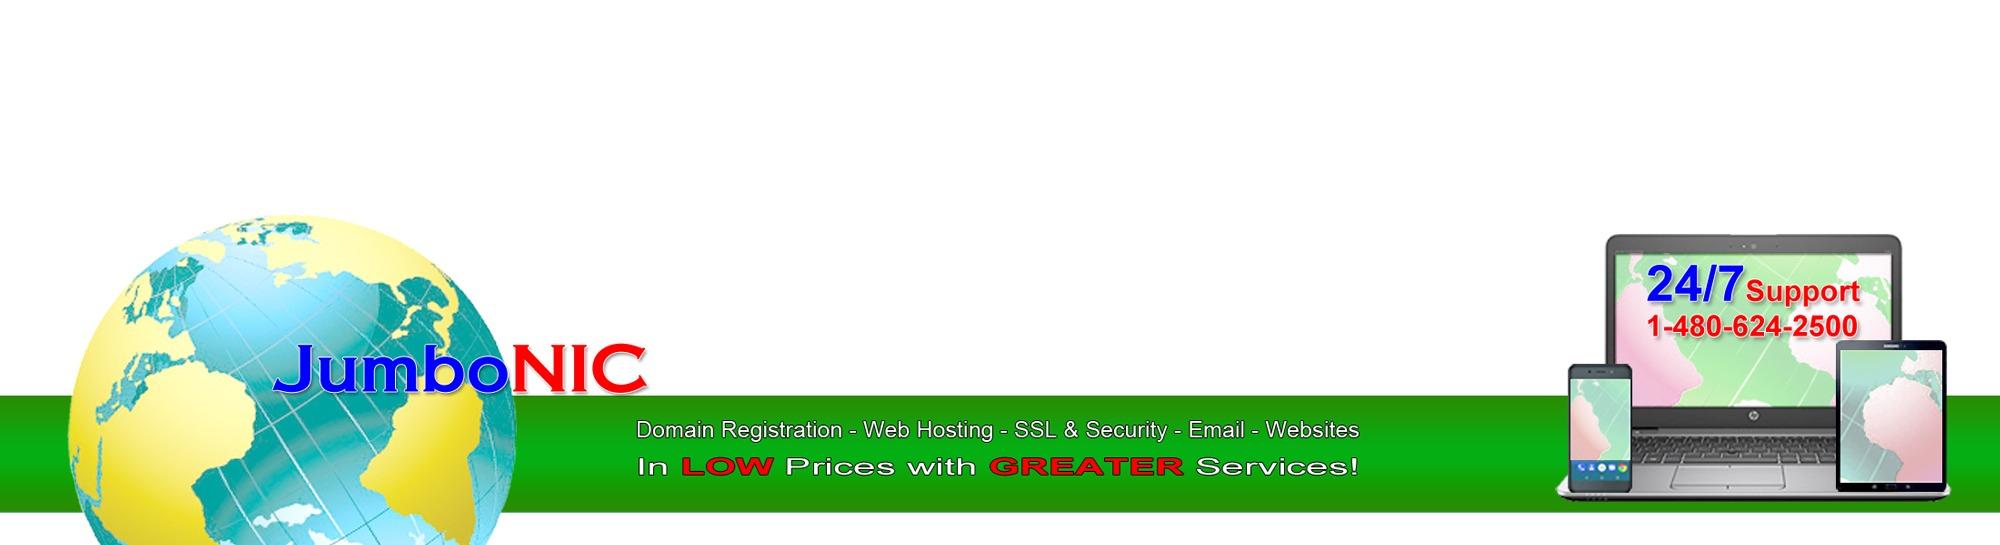 JumboNIC Web Hosting